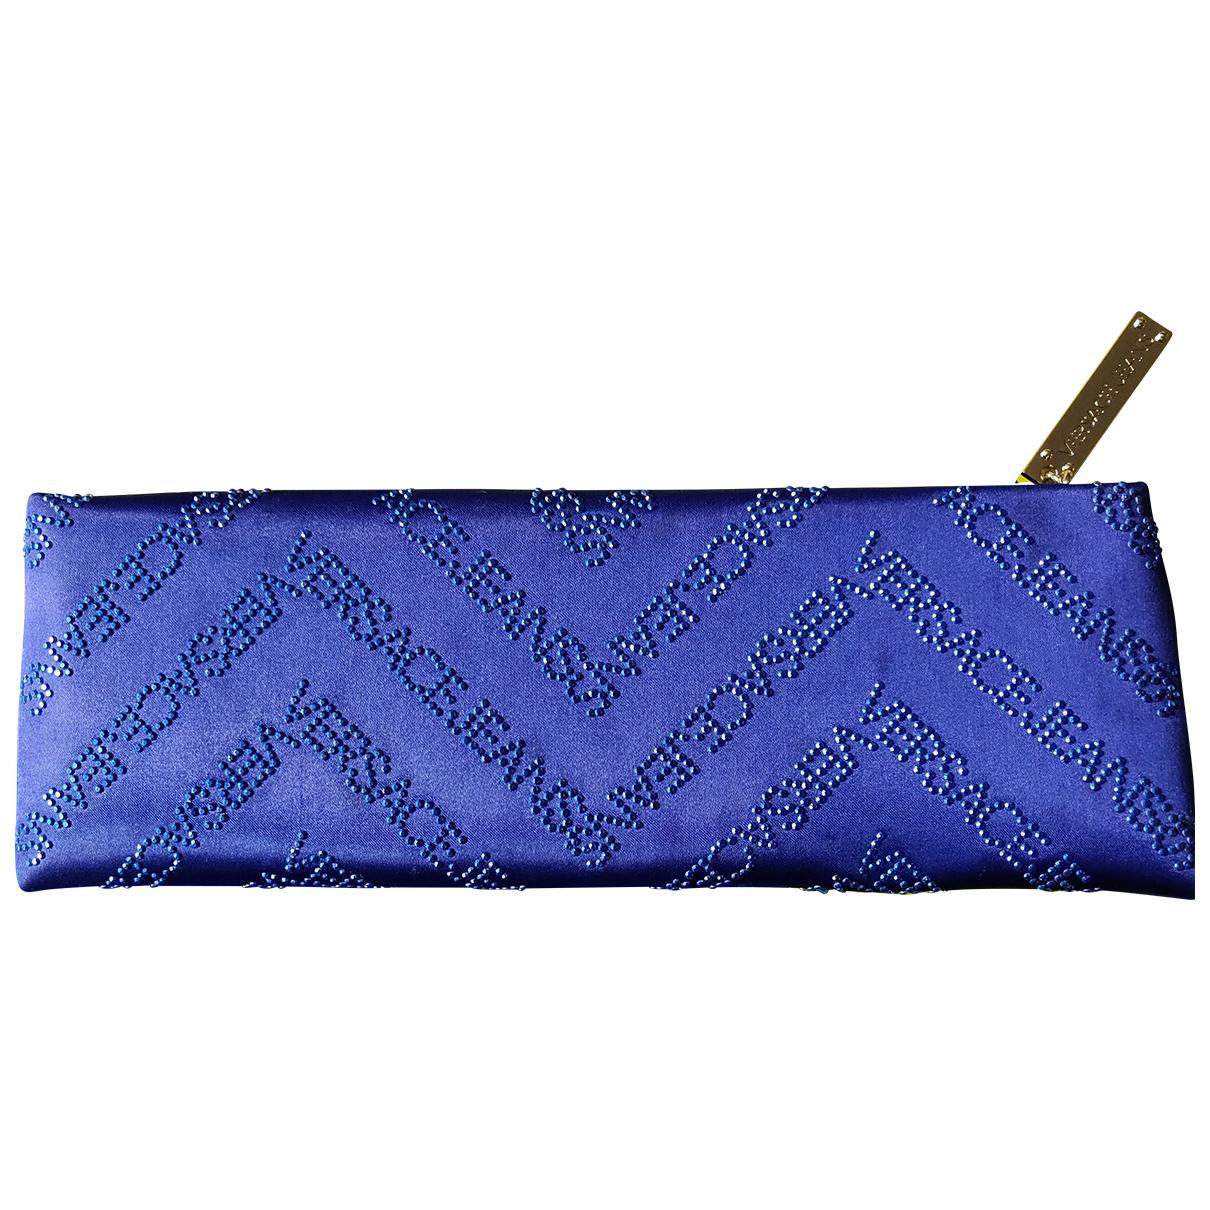 Versace Jeans \N Blue Silk Clutch bag for Women \N